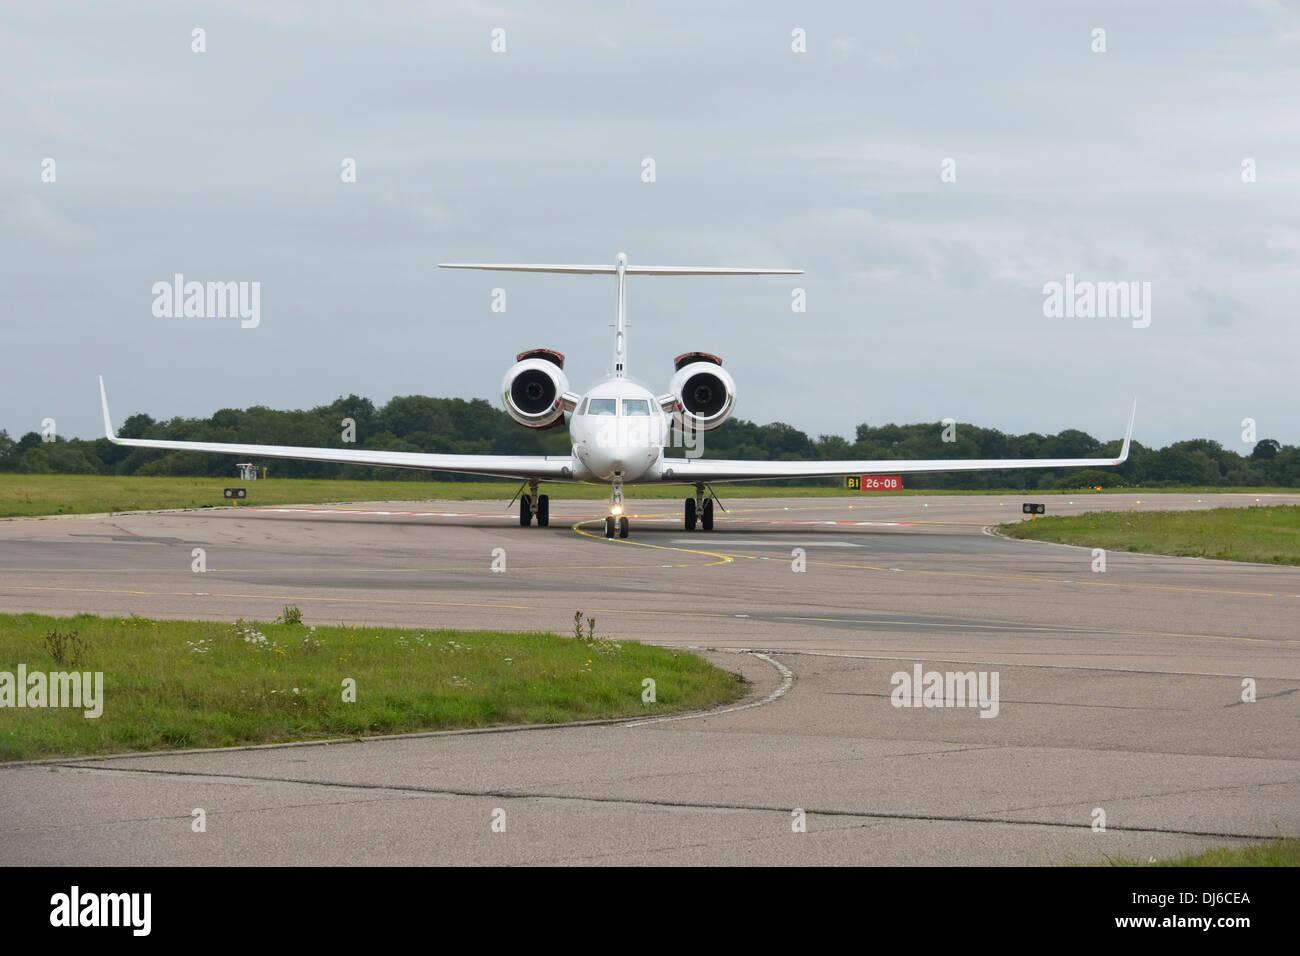 Gulfstream GV-SP (G550) sur la voie de circulation au sol Photo Stock